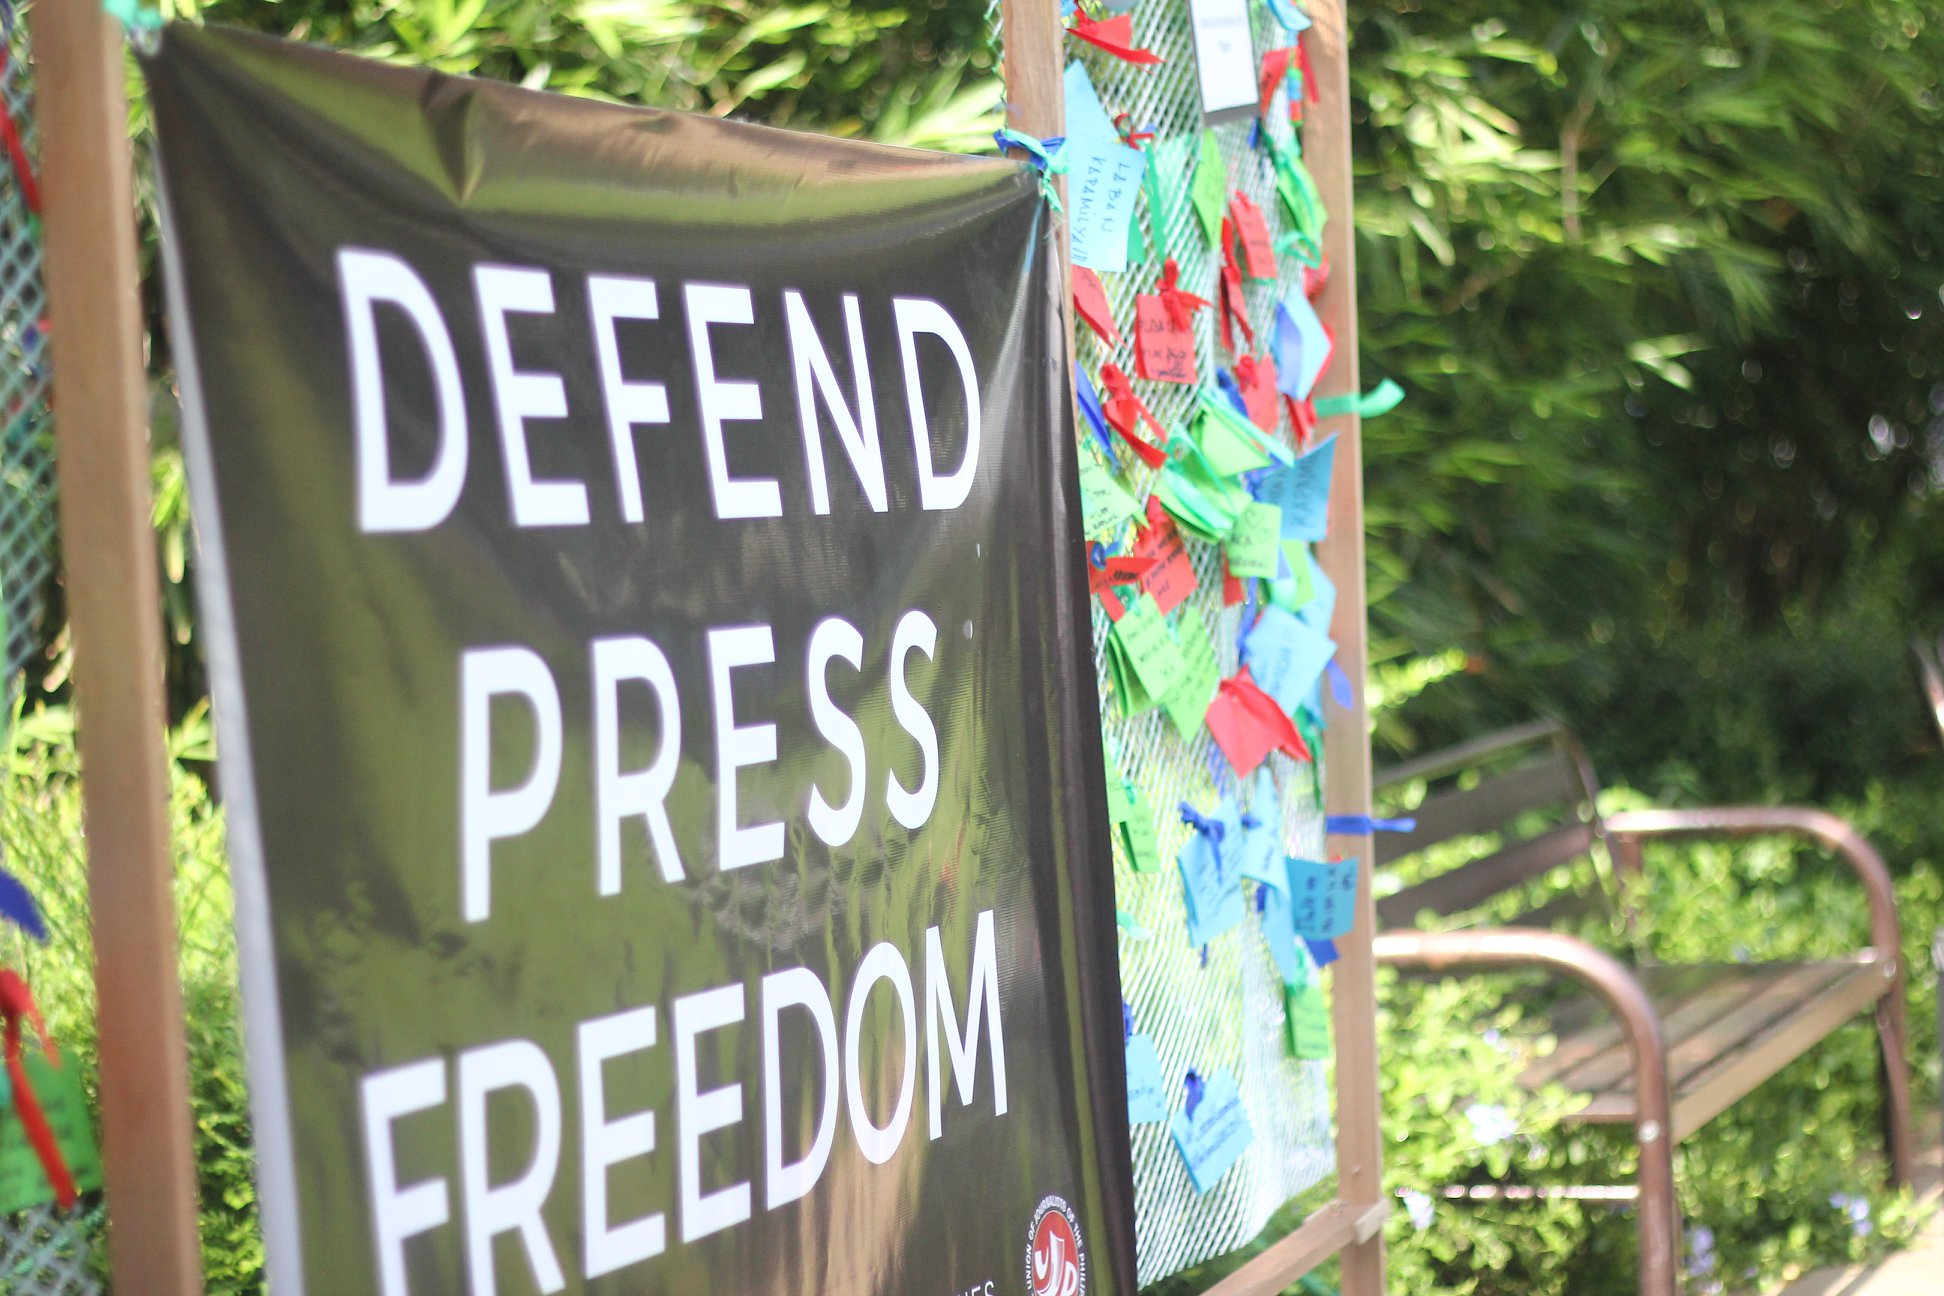 Truthtellers Under Siege: Worsening Media Repression under the Duterte Administration